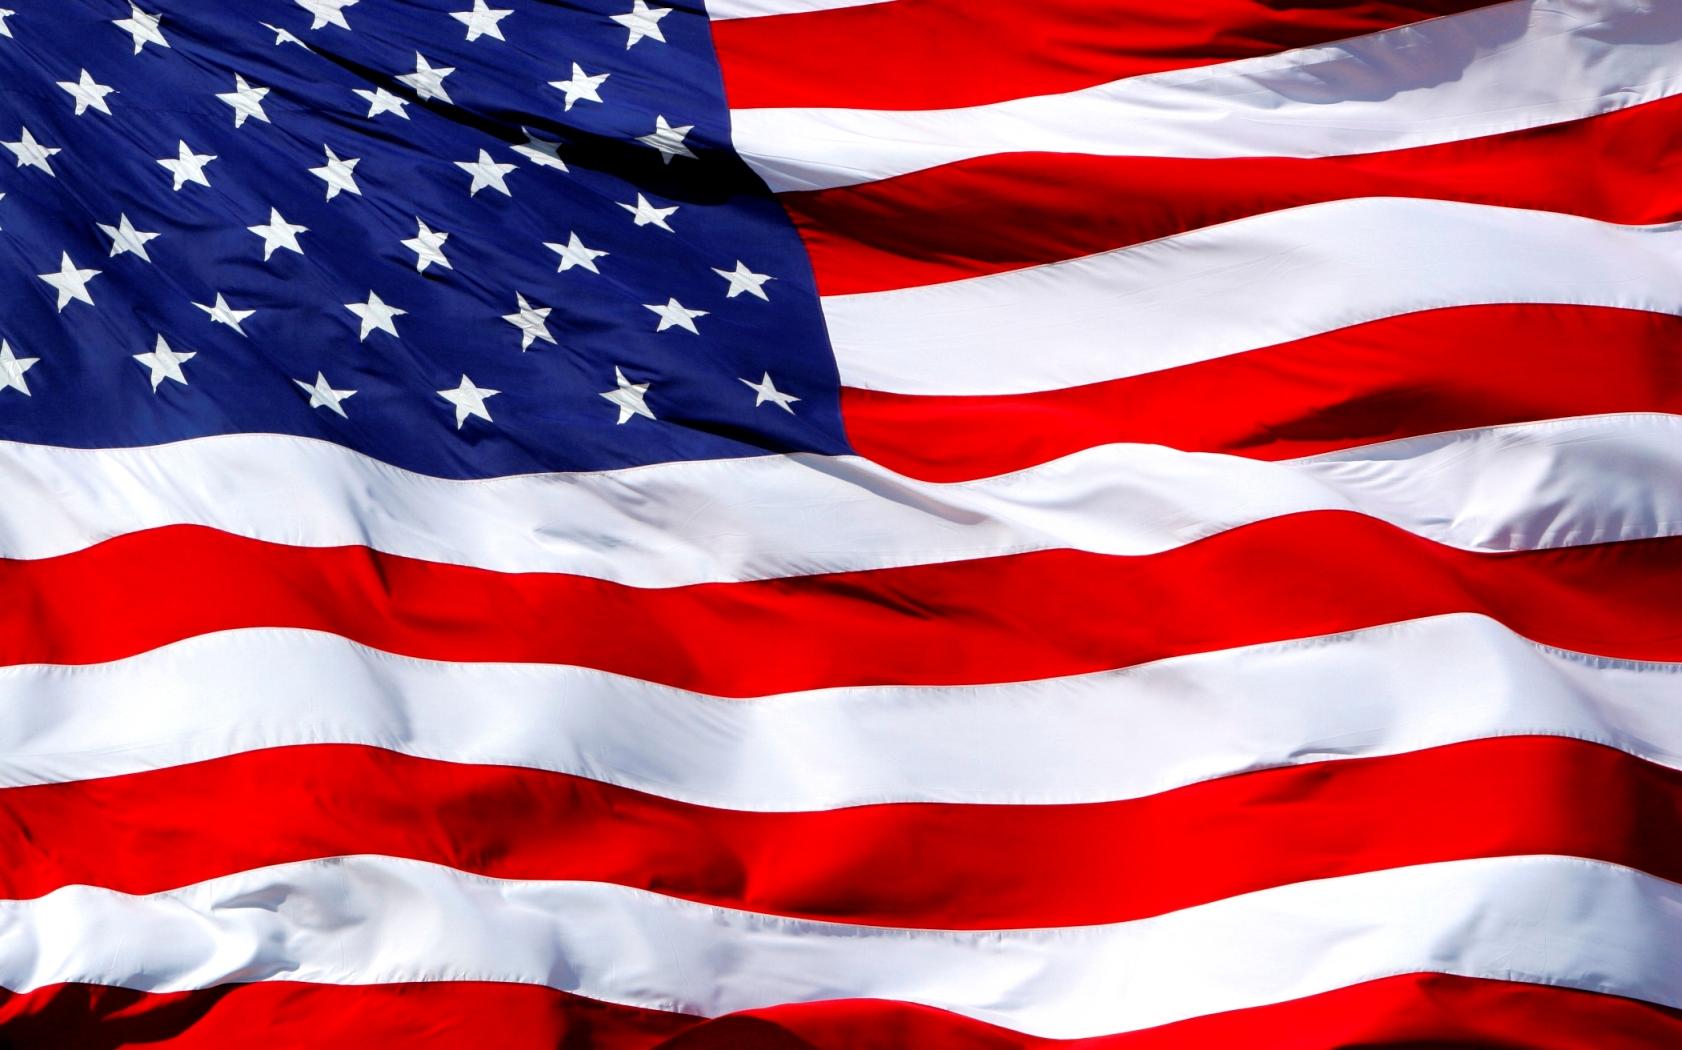 wallpaper American Flag Wallpaper hd wallpaper background desktop 1682x1050